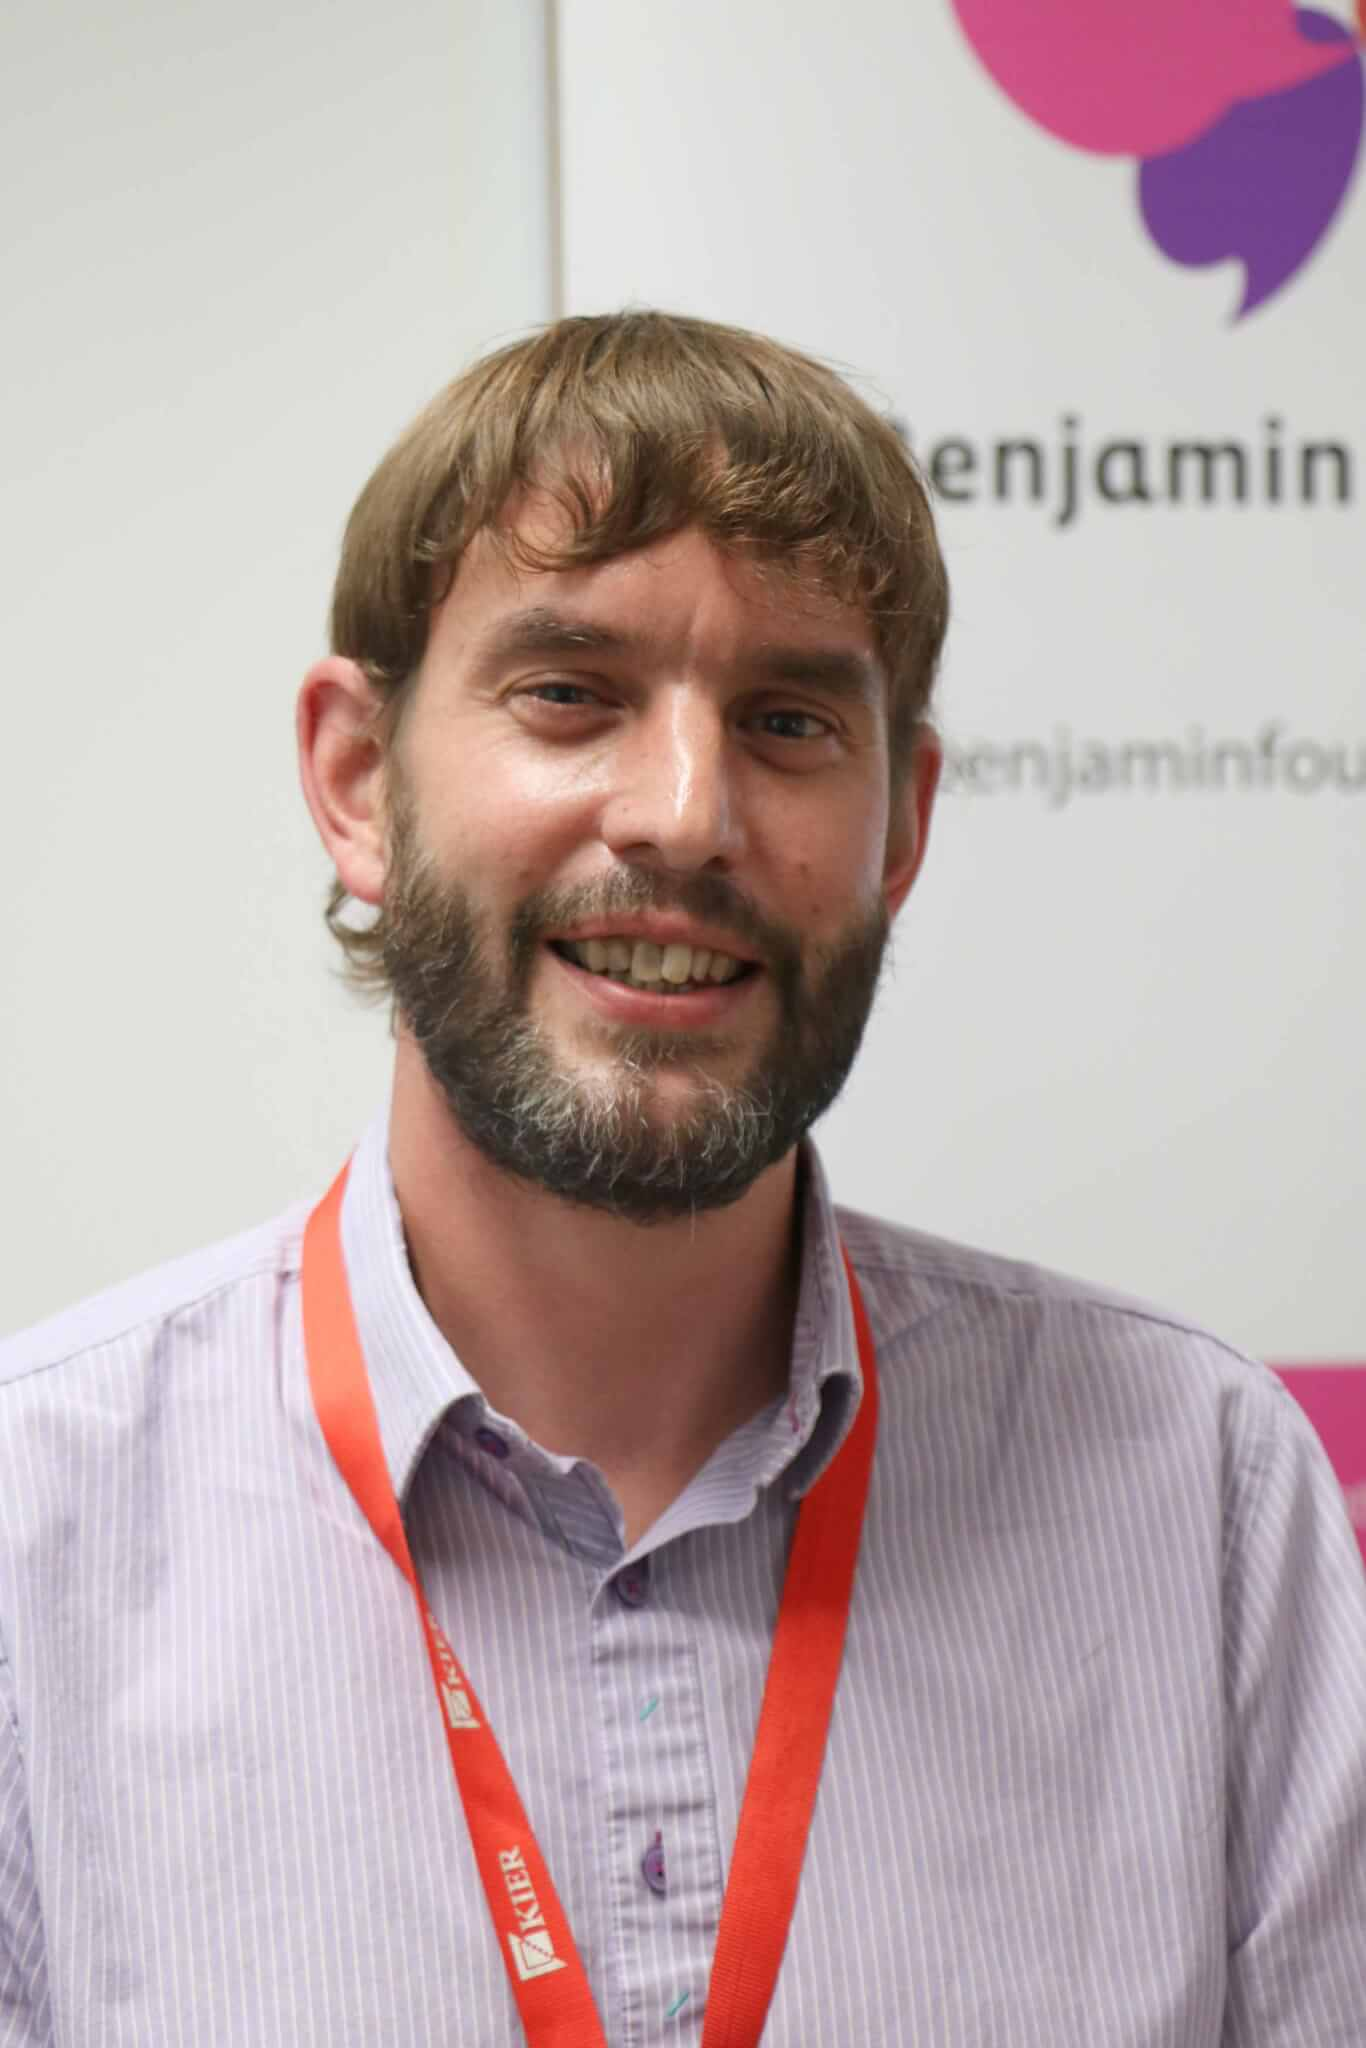 Stephen Ede's profile image